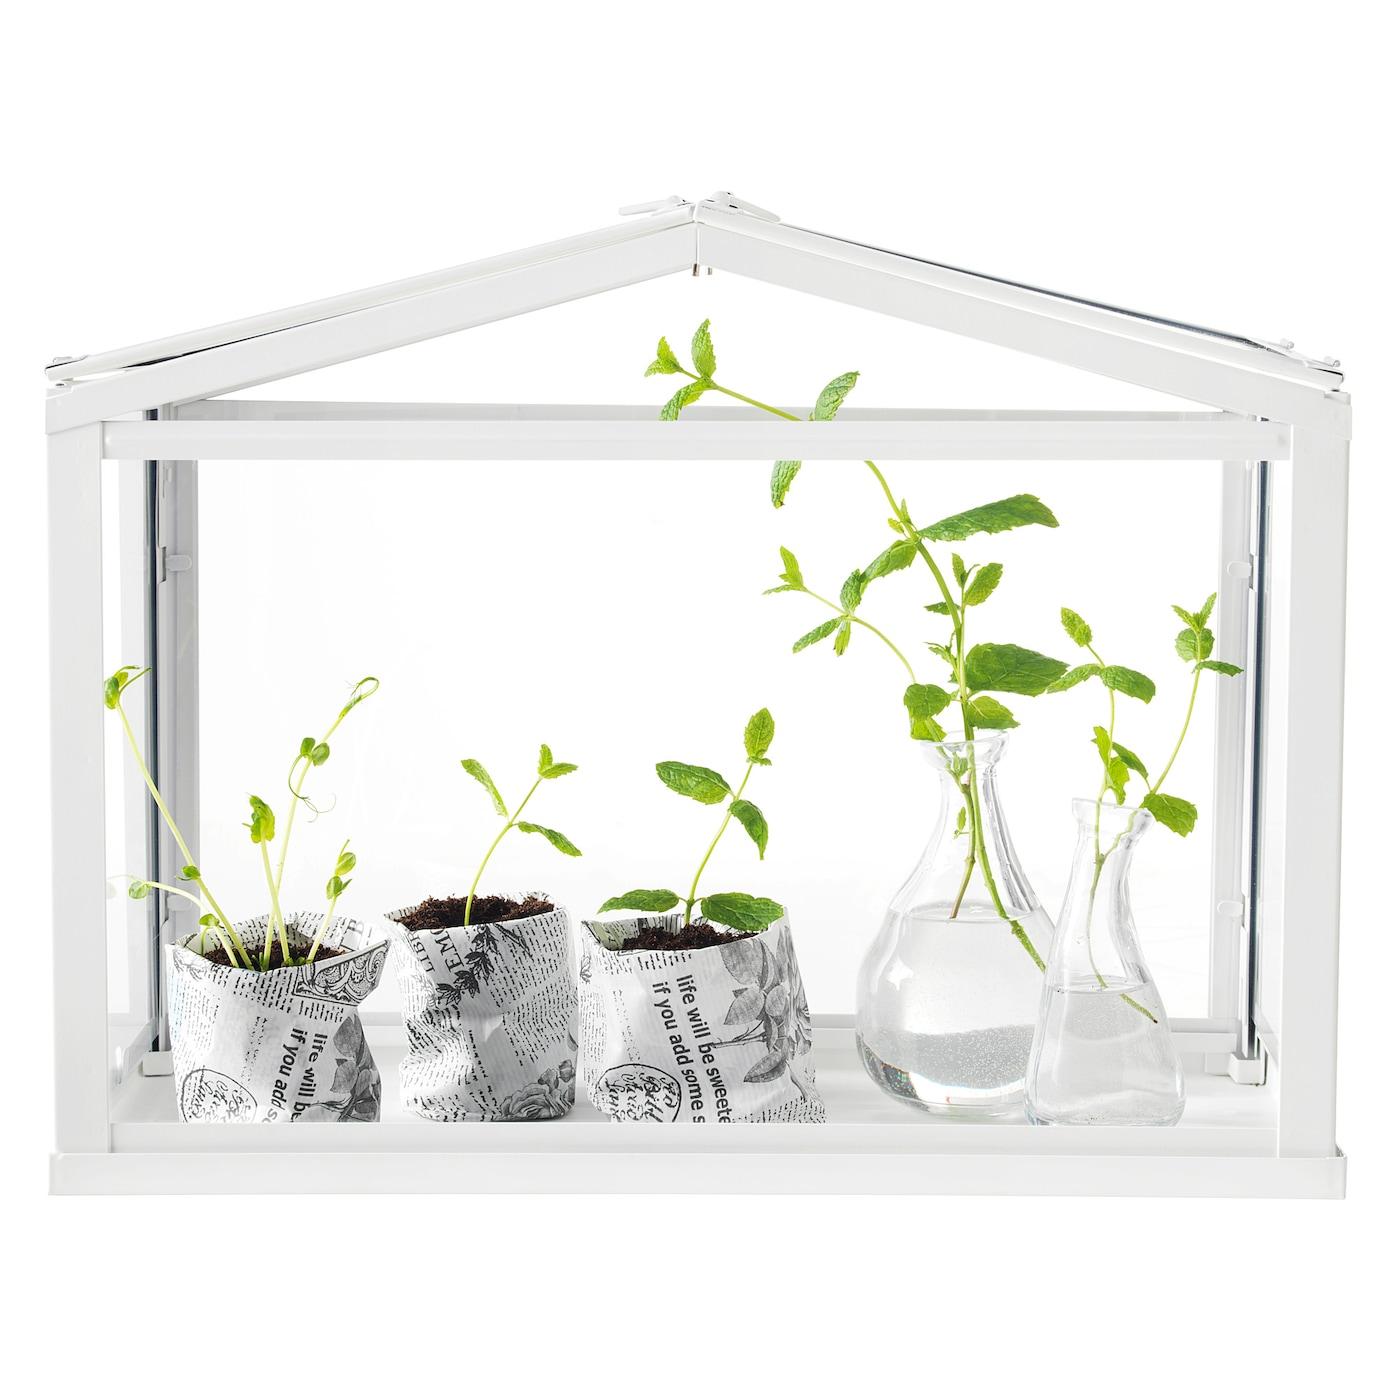 SOCKER Greenhouse, white, perfect for Ikea classroom